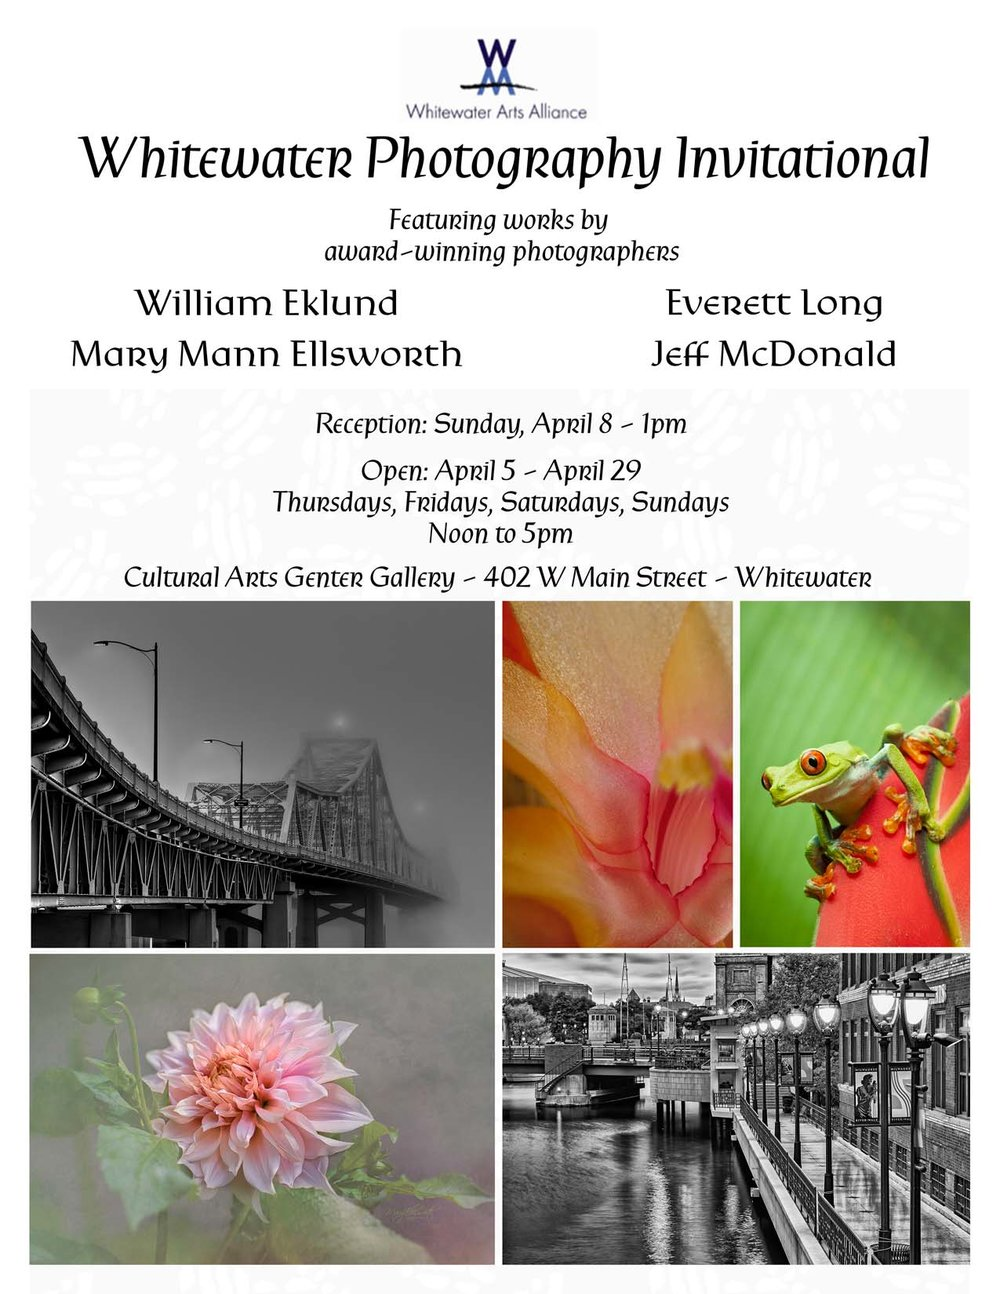 WAA 2018 Photo Invitational Poster.jpg